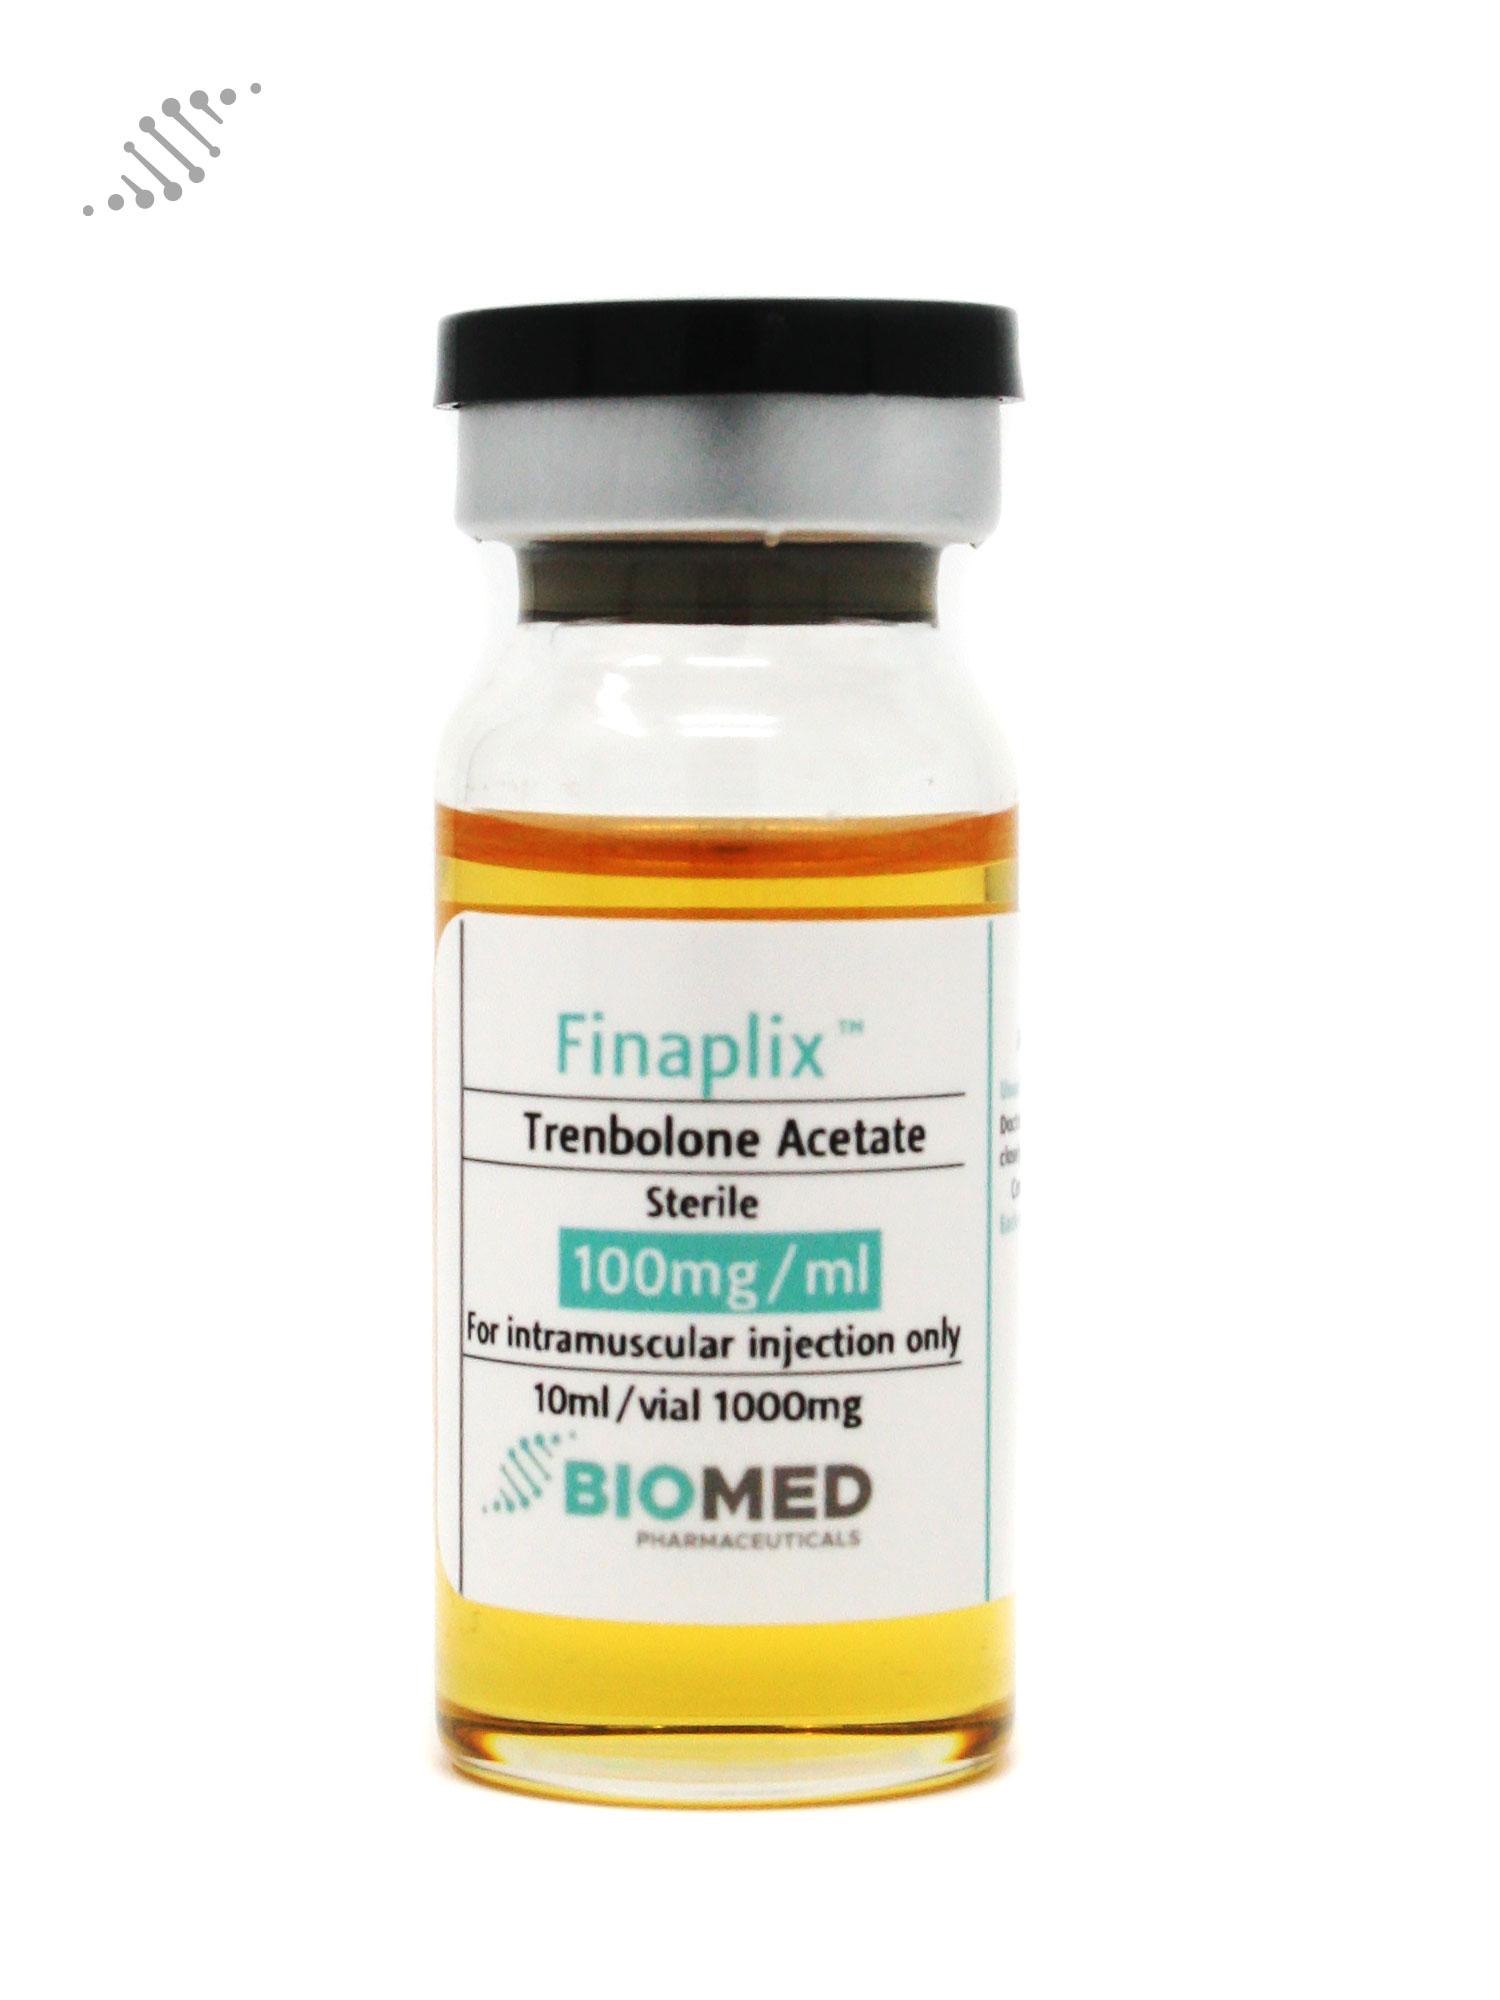 Finaplix Trenbolone Acetate 100ml